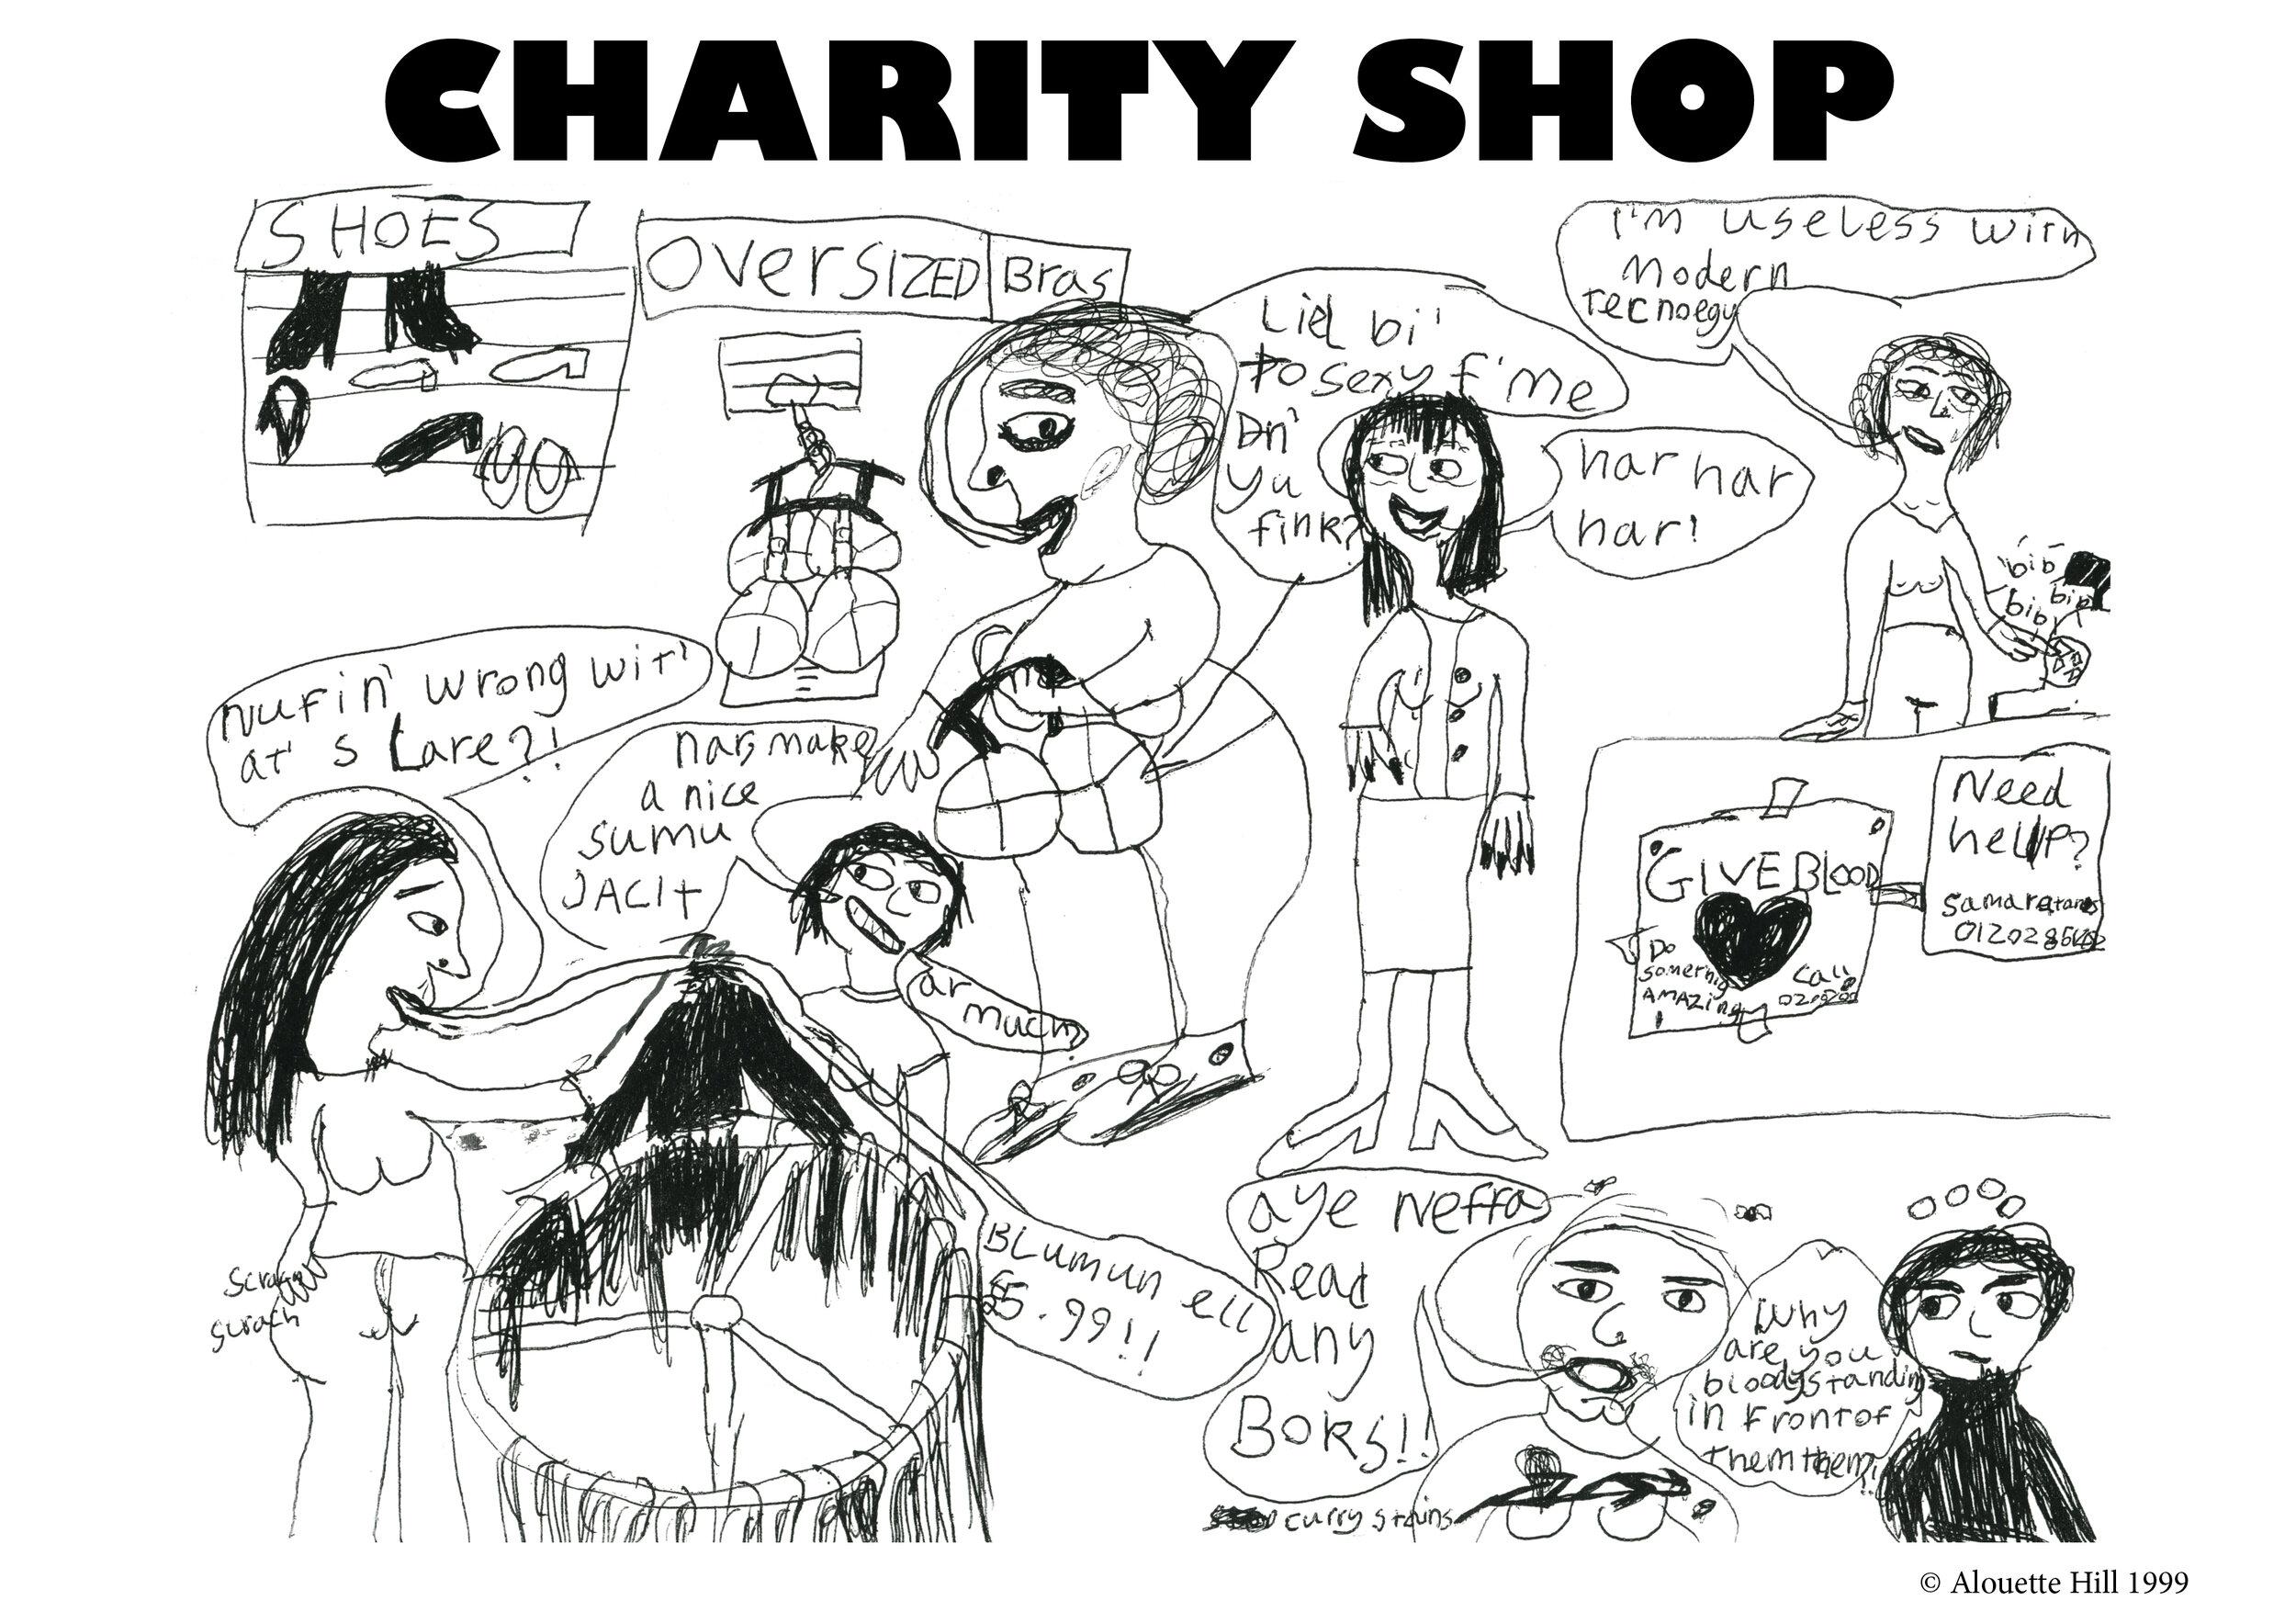 charity shop edited.jpg